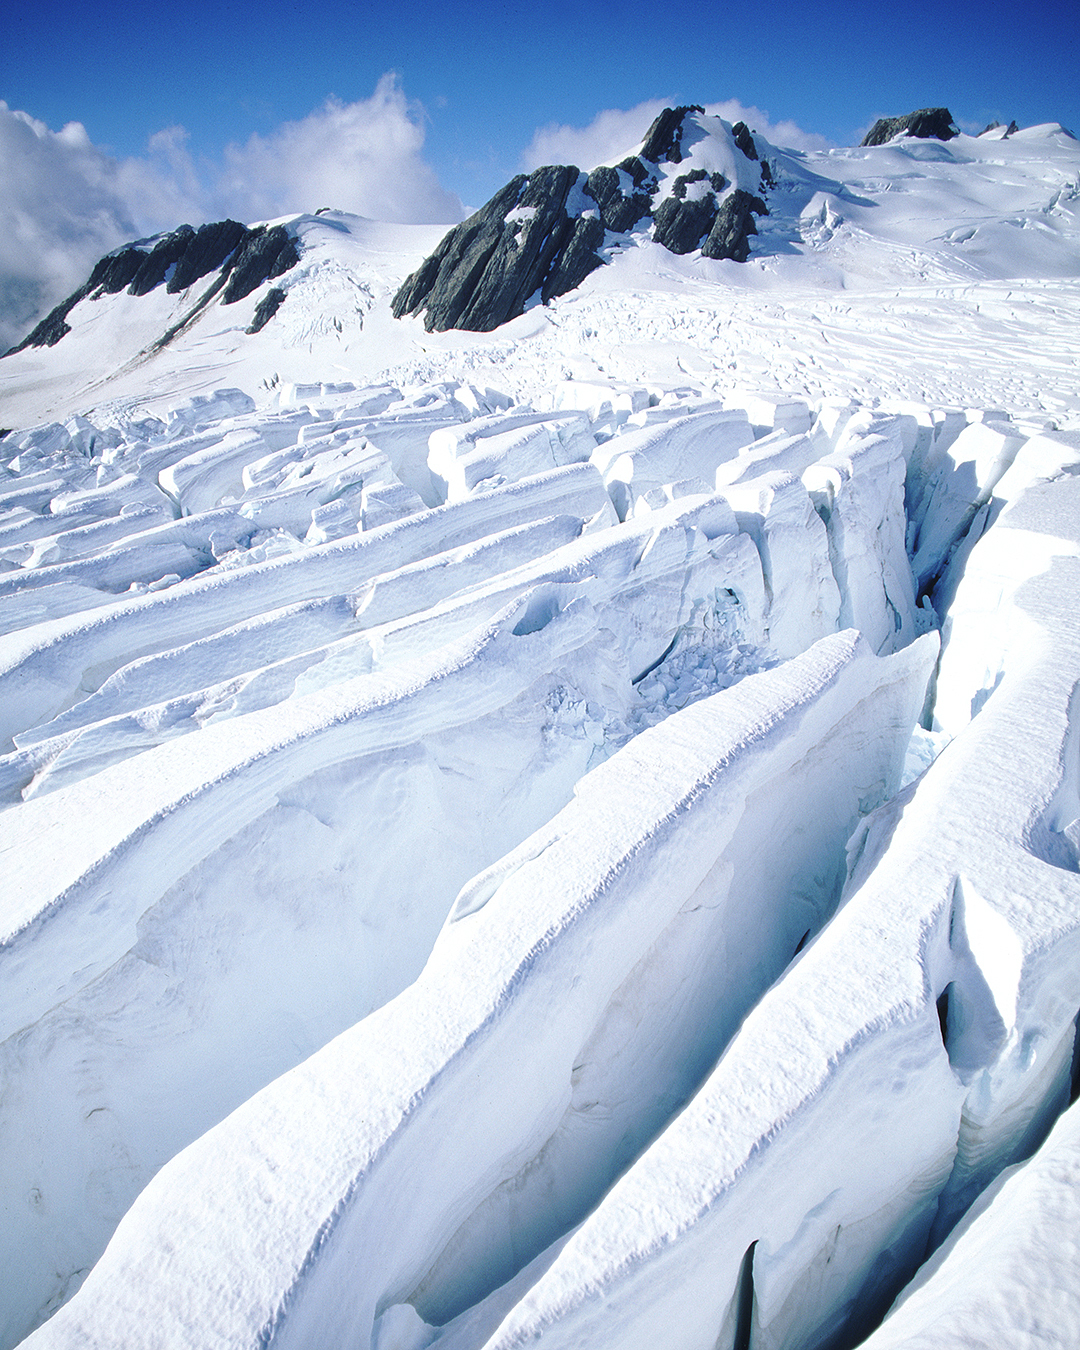 Deep snow and mountains at Franz Joseph Glacier